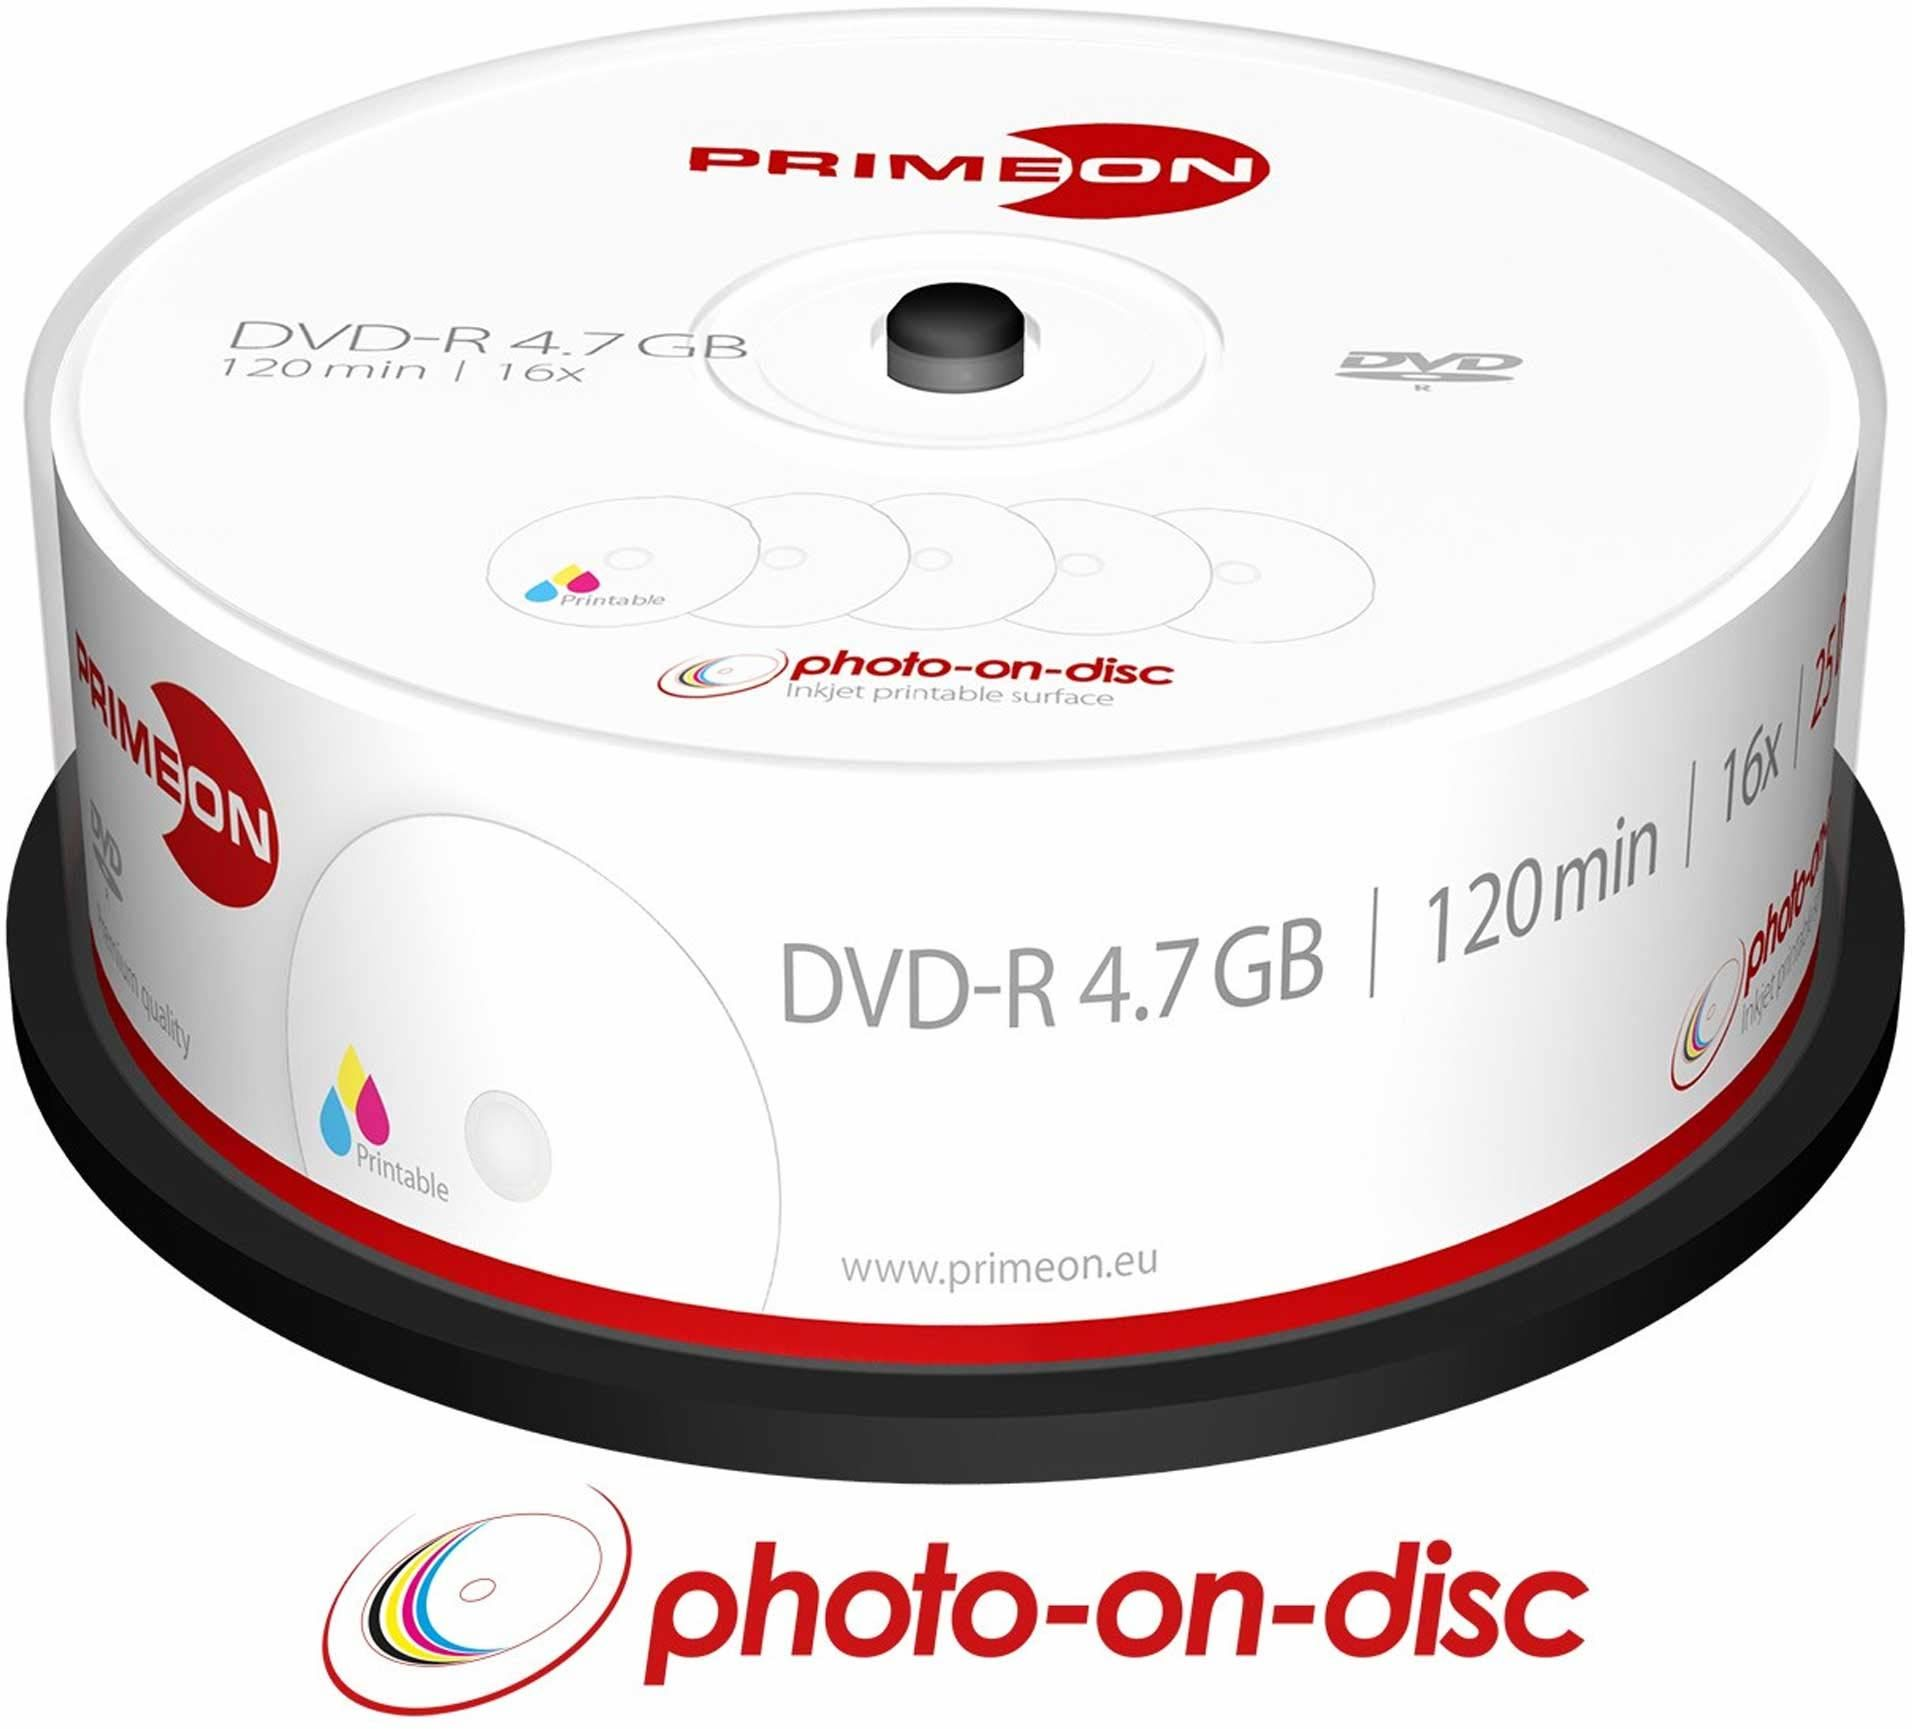 Primeon DVD-R 4,7 GB/120 min/16 x pudełko na kanapki, foto-on-disc, Inkjet Full Size Printable Surface (25 płyt)